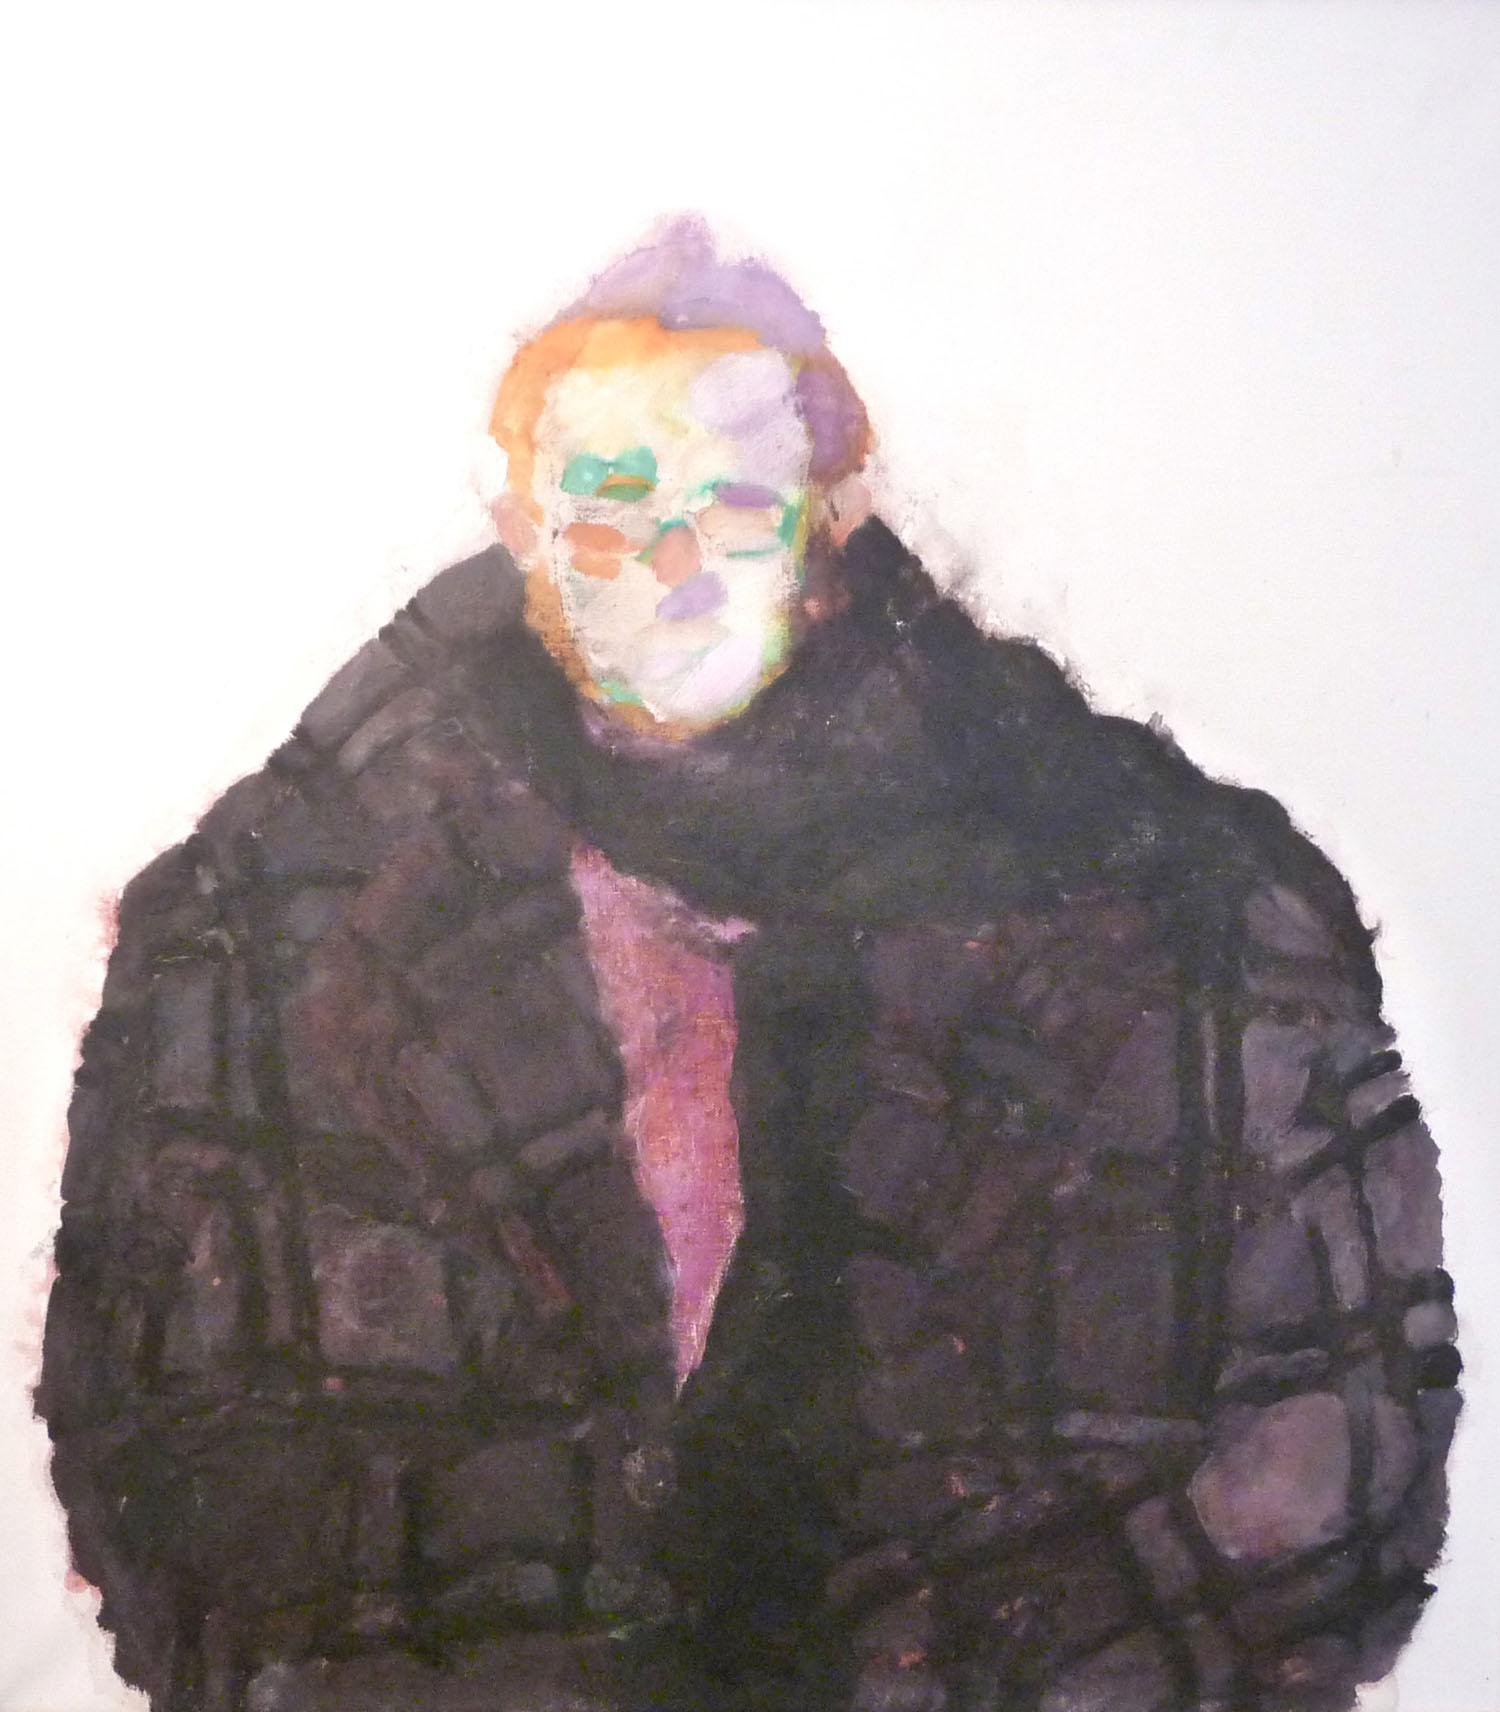 Neil Shawcross